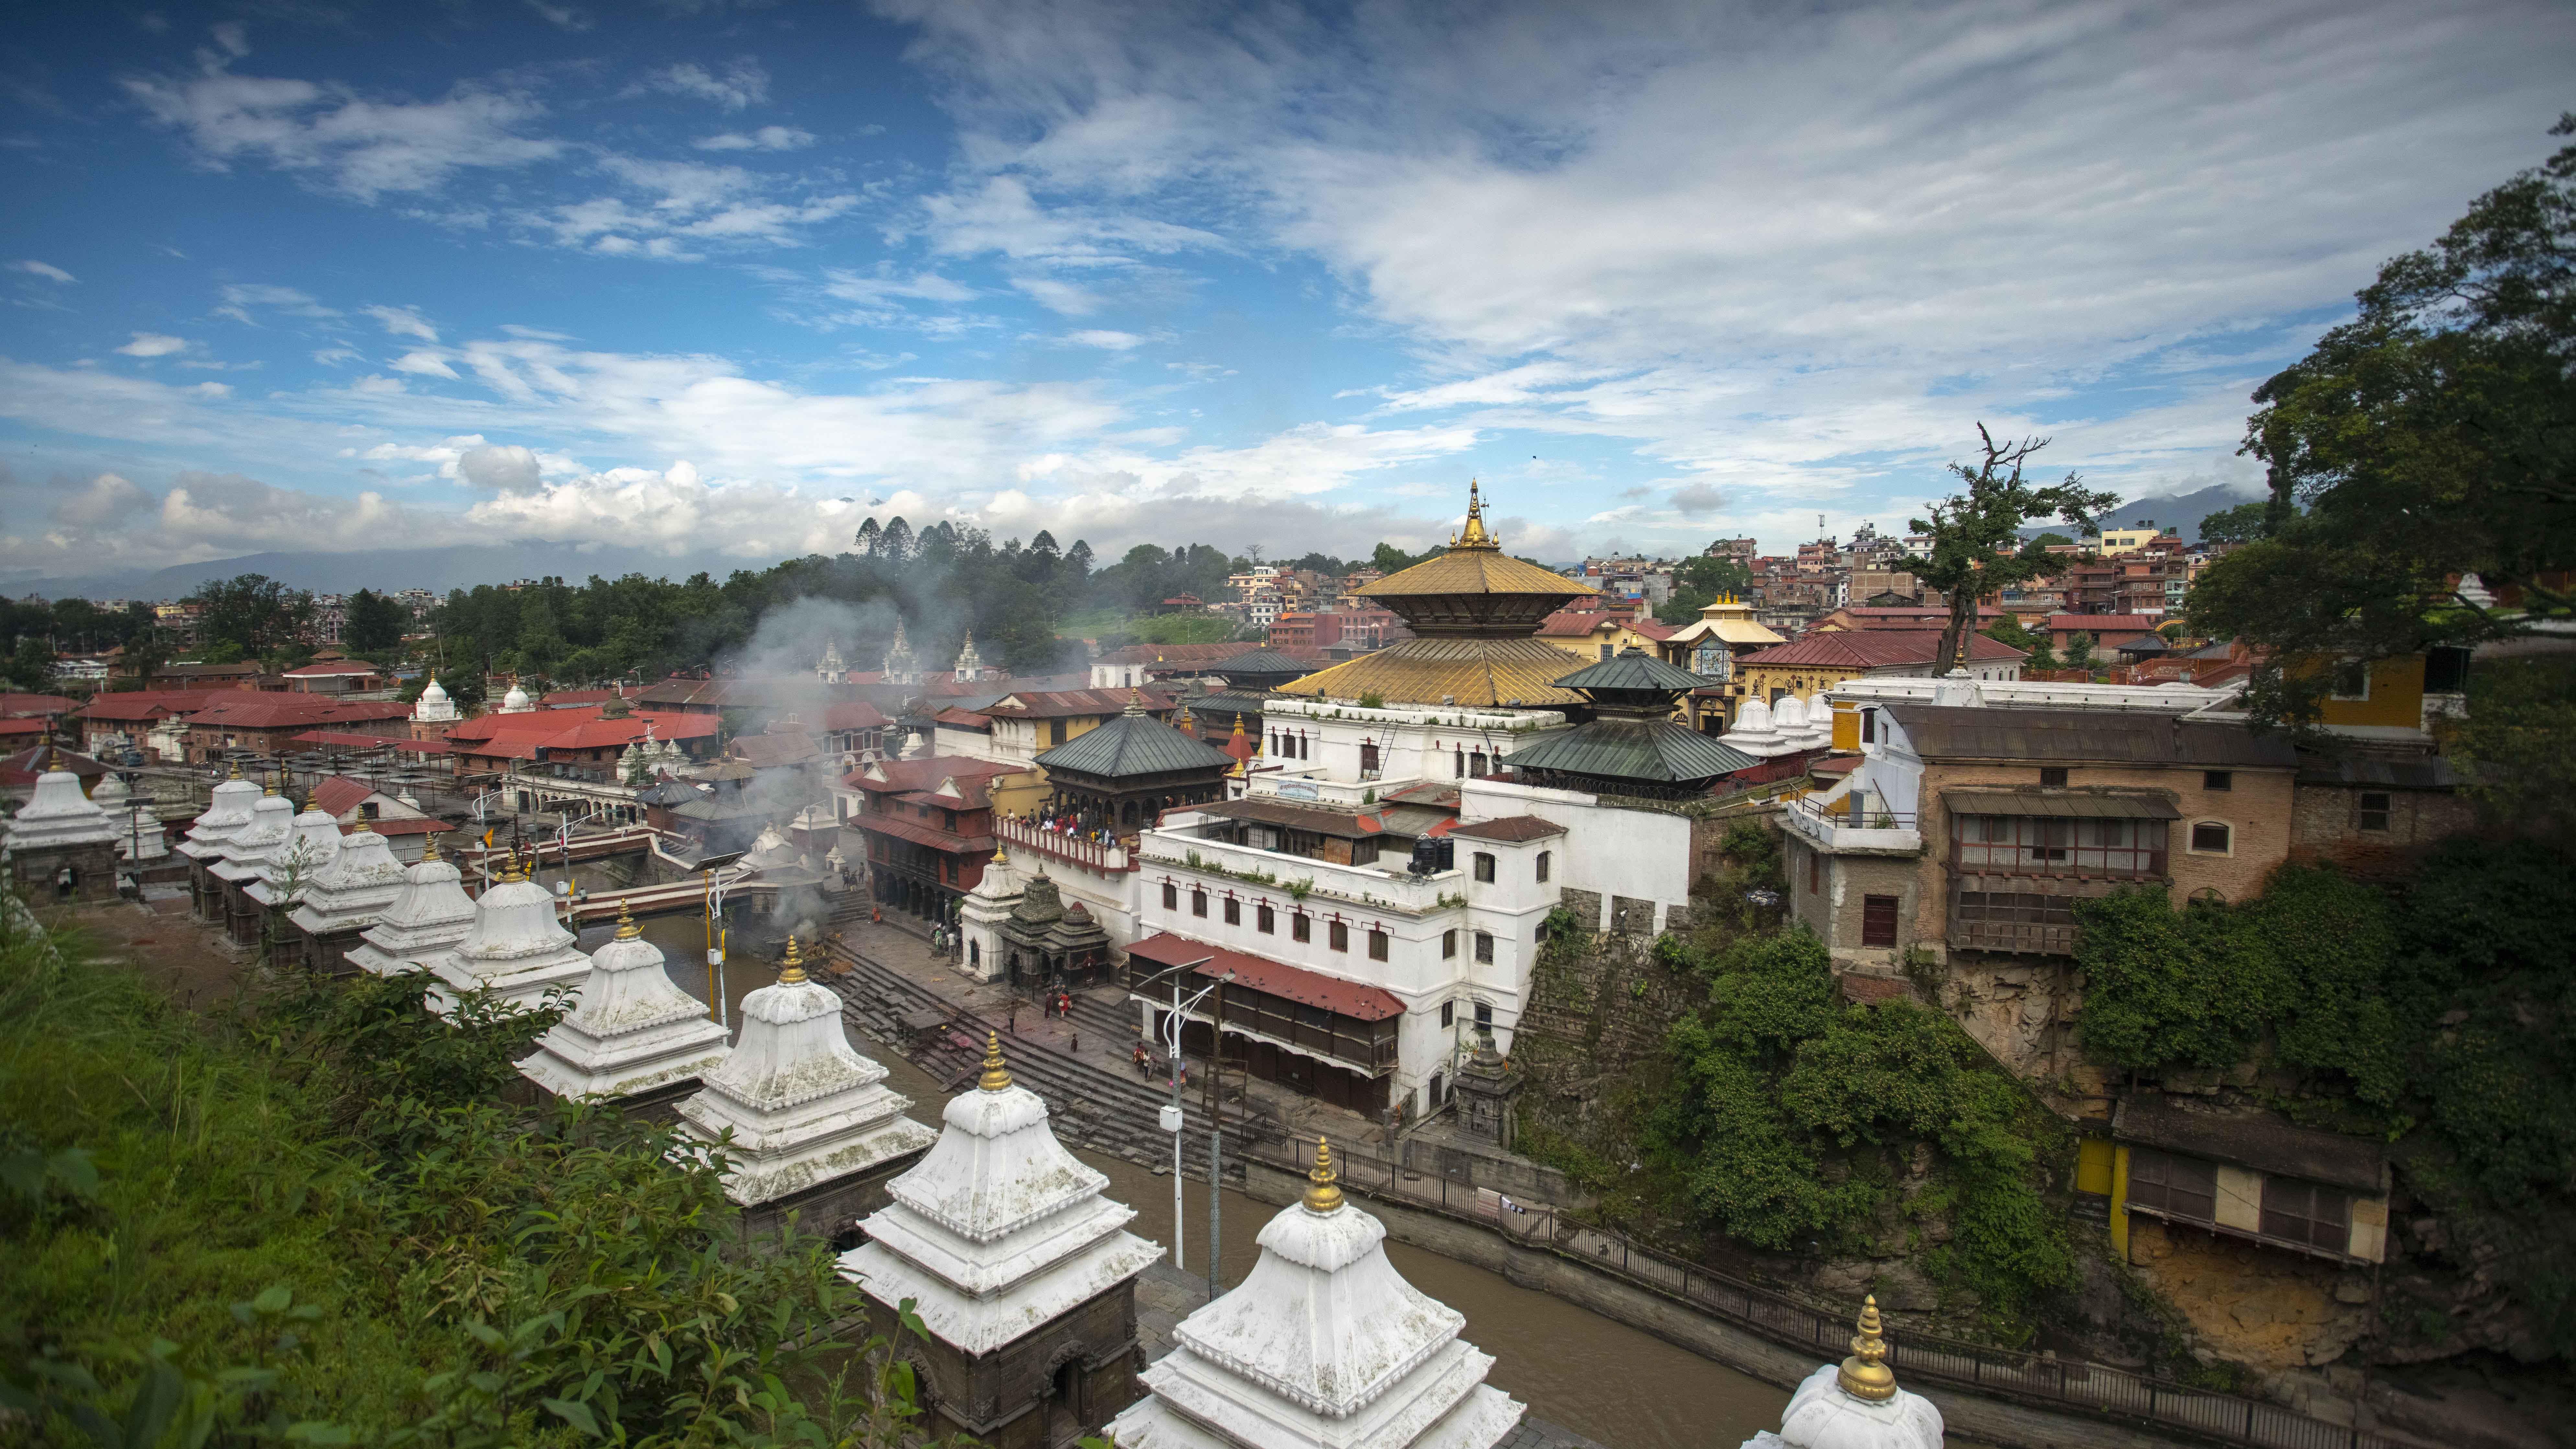 film-location-in-nepal-pashupatinath